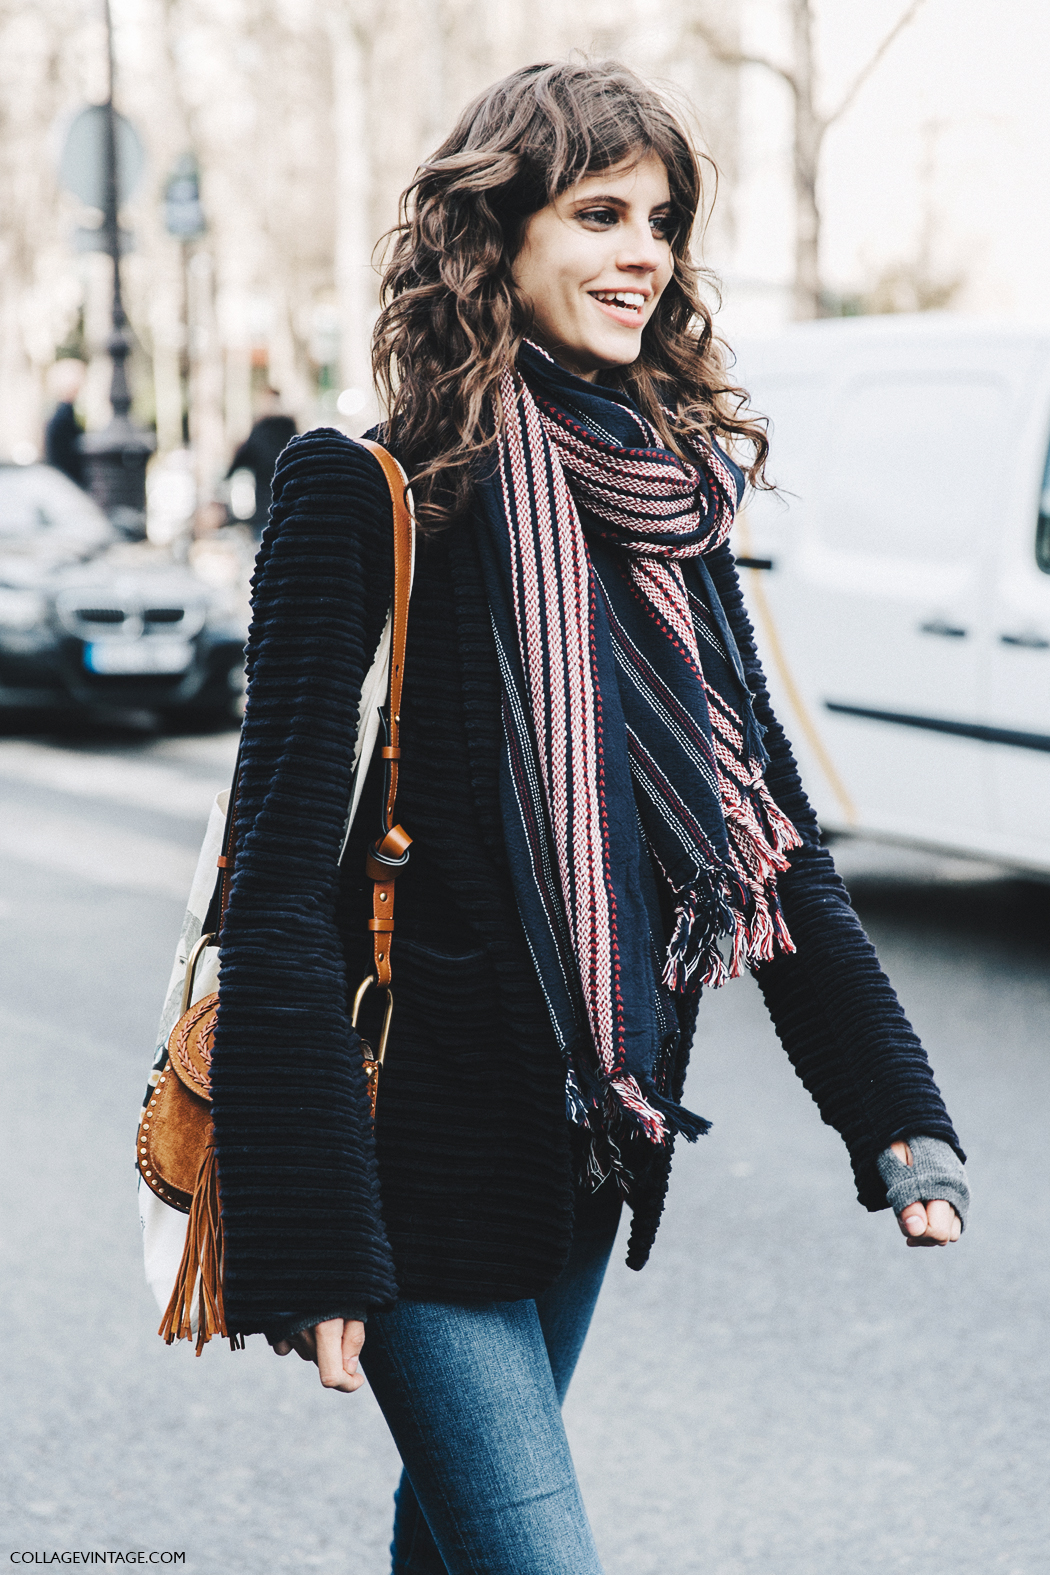 PFW-Paris_Fashion_Week_Fall_2016-Street_Style-Collage_Vintage-Model_Chloe-4